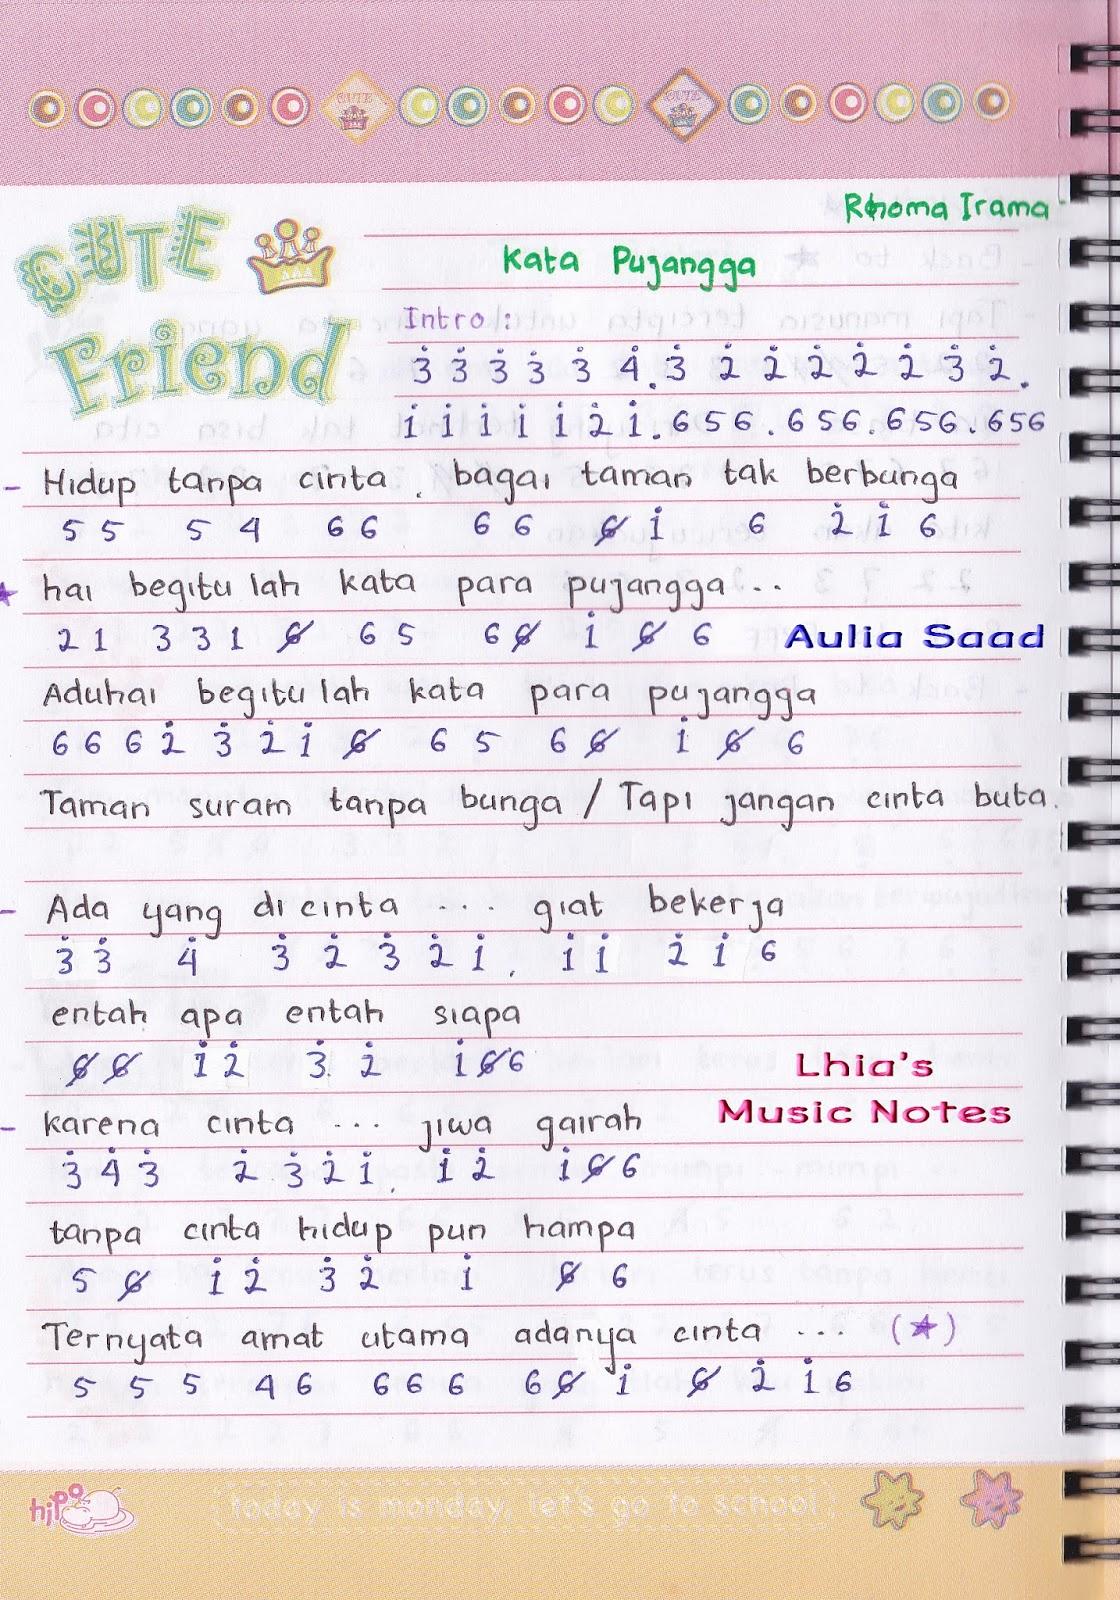 Orquite Mark Lirik Lagu Melayu Kata Pujangga